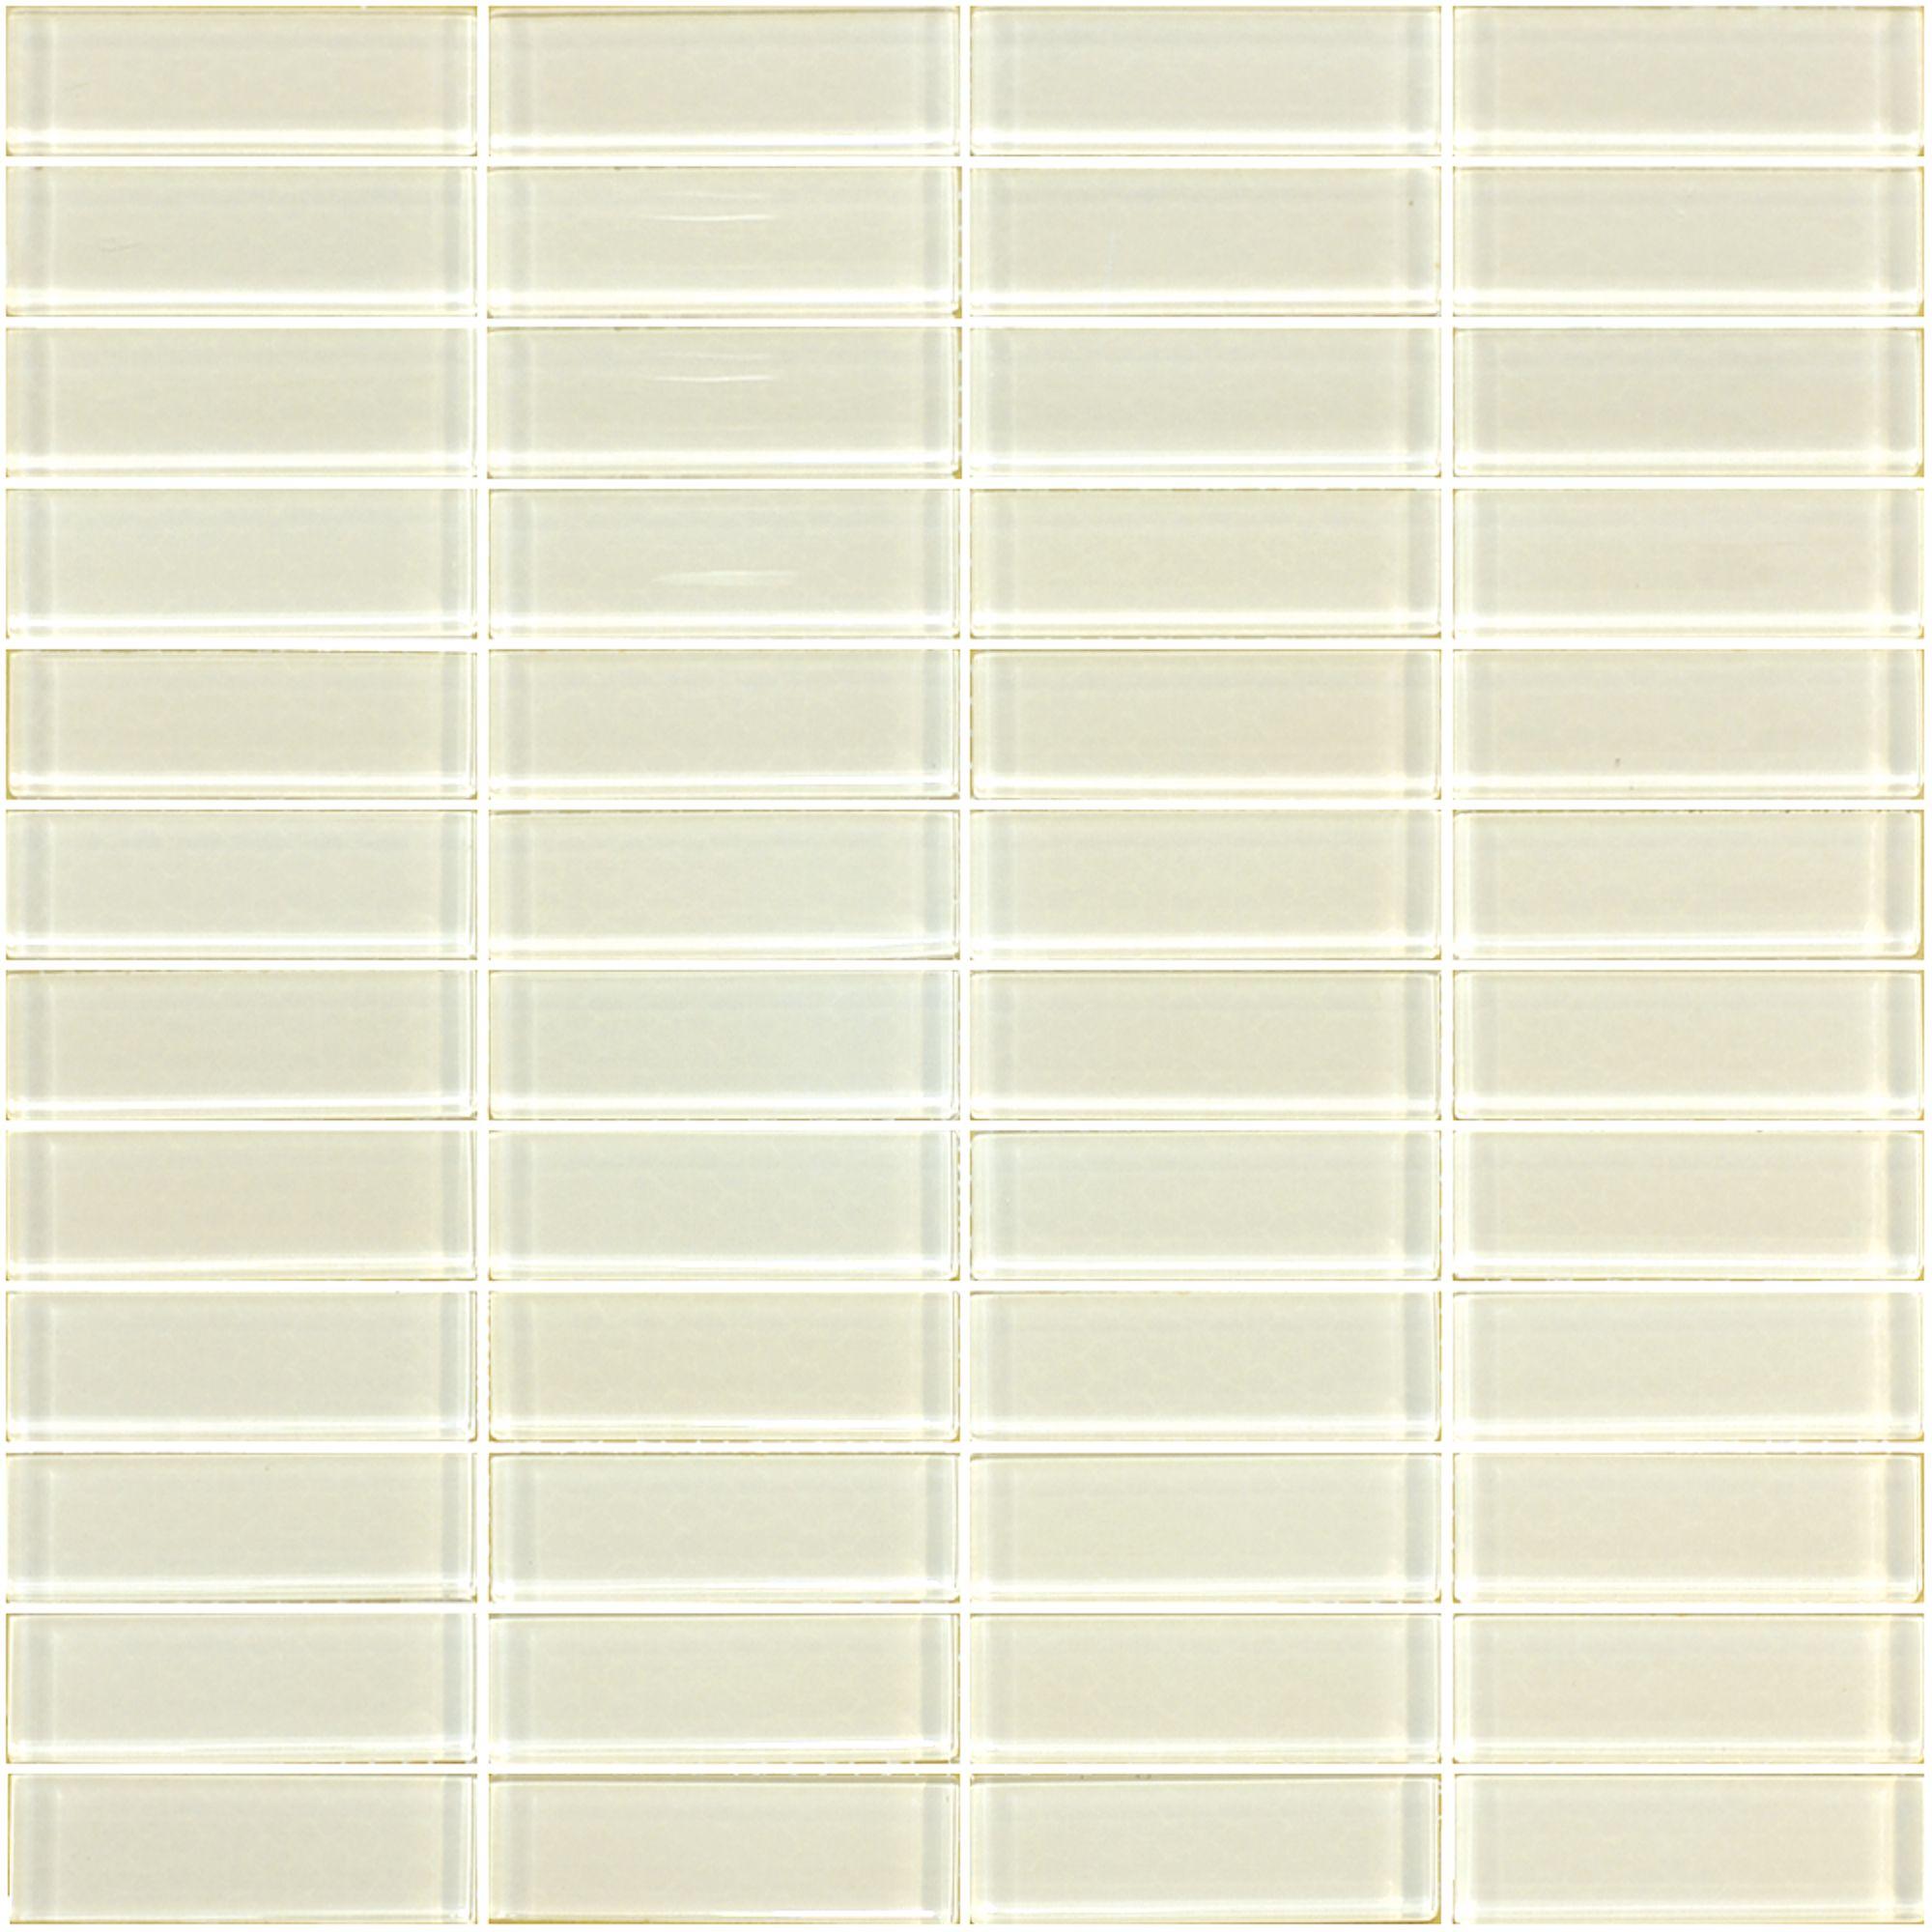 Tile Gl Mosaic 22x73mm Sheet Whte 06t 1100 Bunnings Warehouse